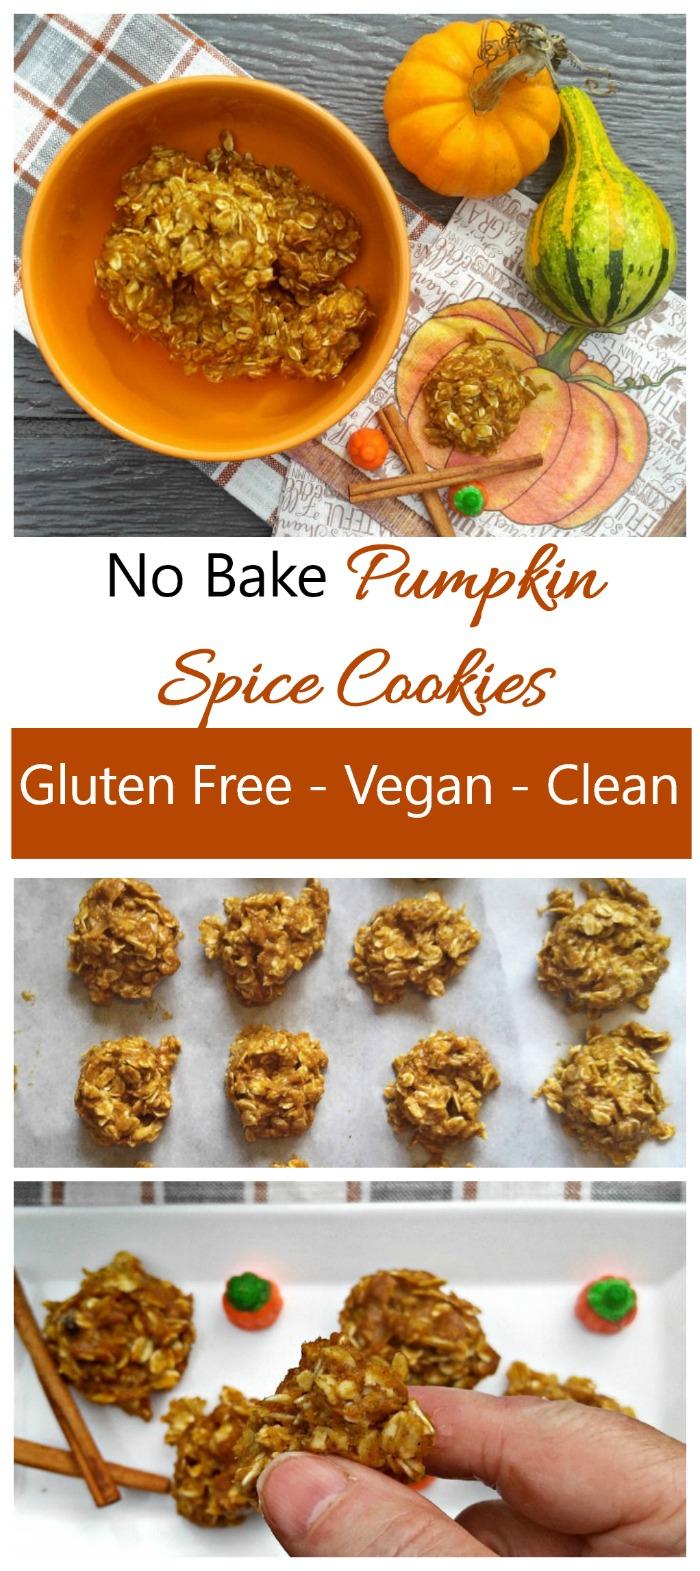 Pumpkin Spice Cookies - No Bake Gluten Free Pumpkin Cookies